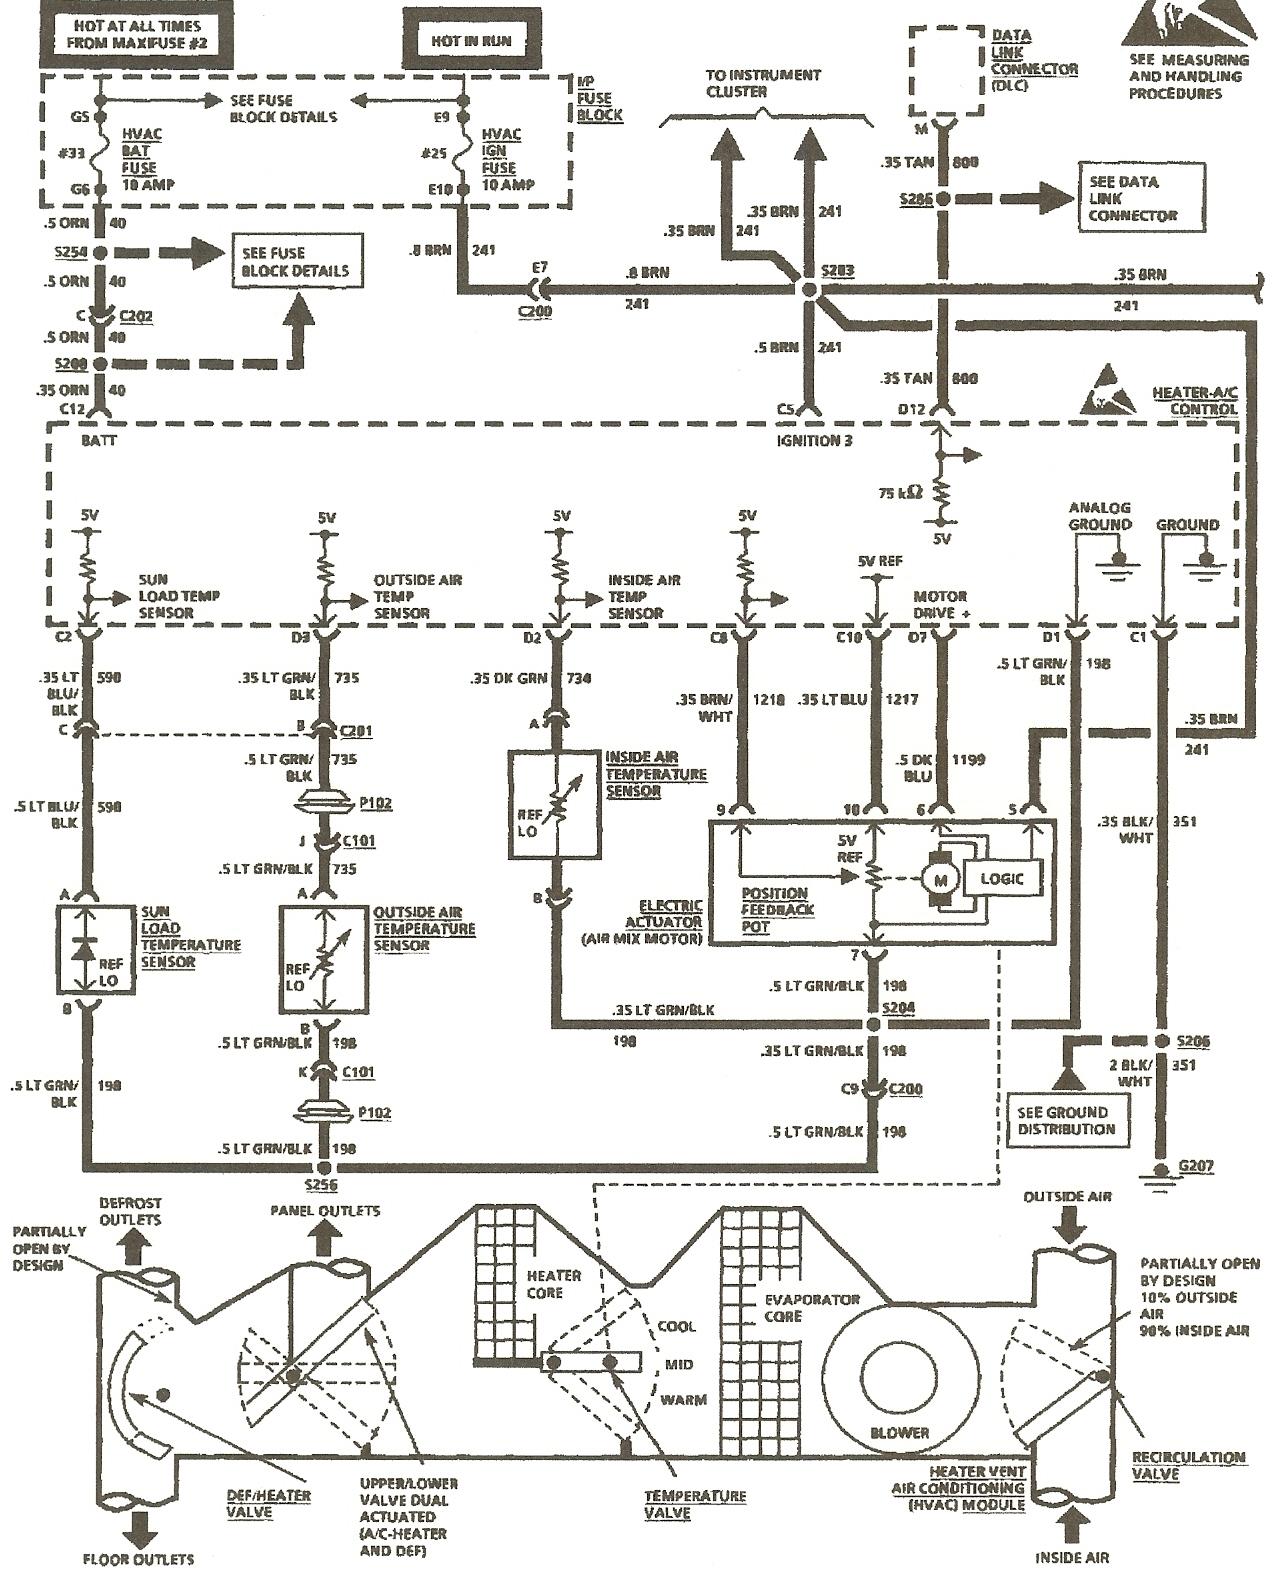 1993 Jeep Wrangler Yj Fuse Box Diagram : I have a 1993